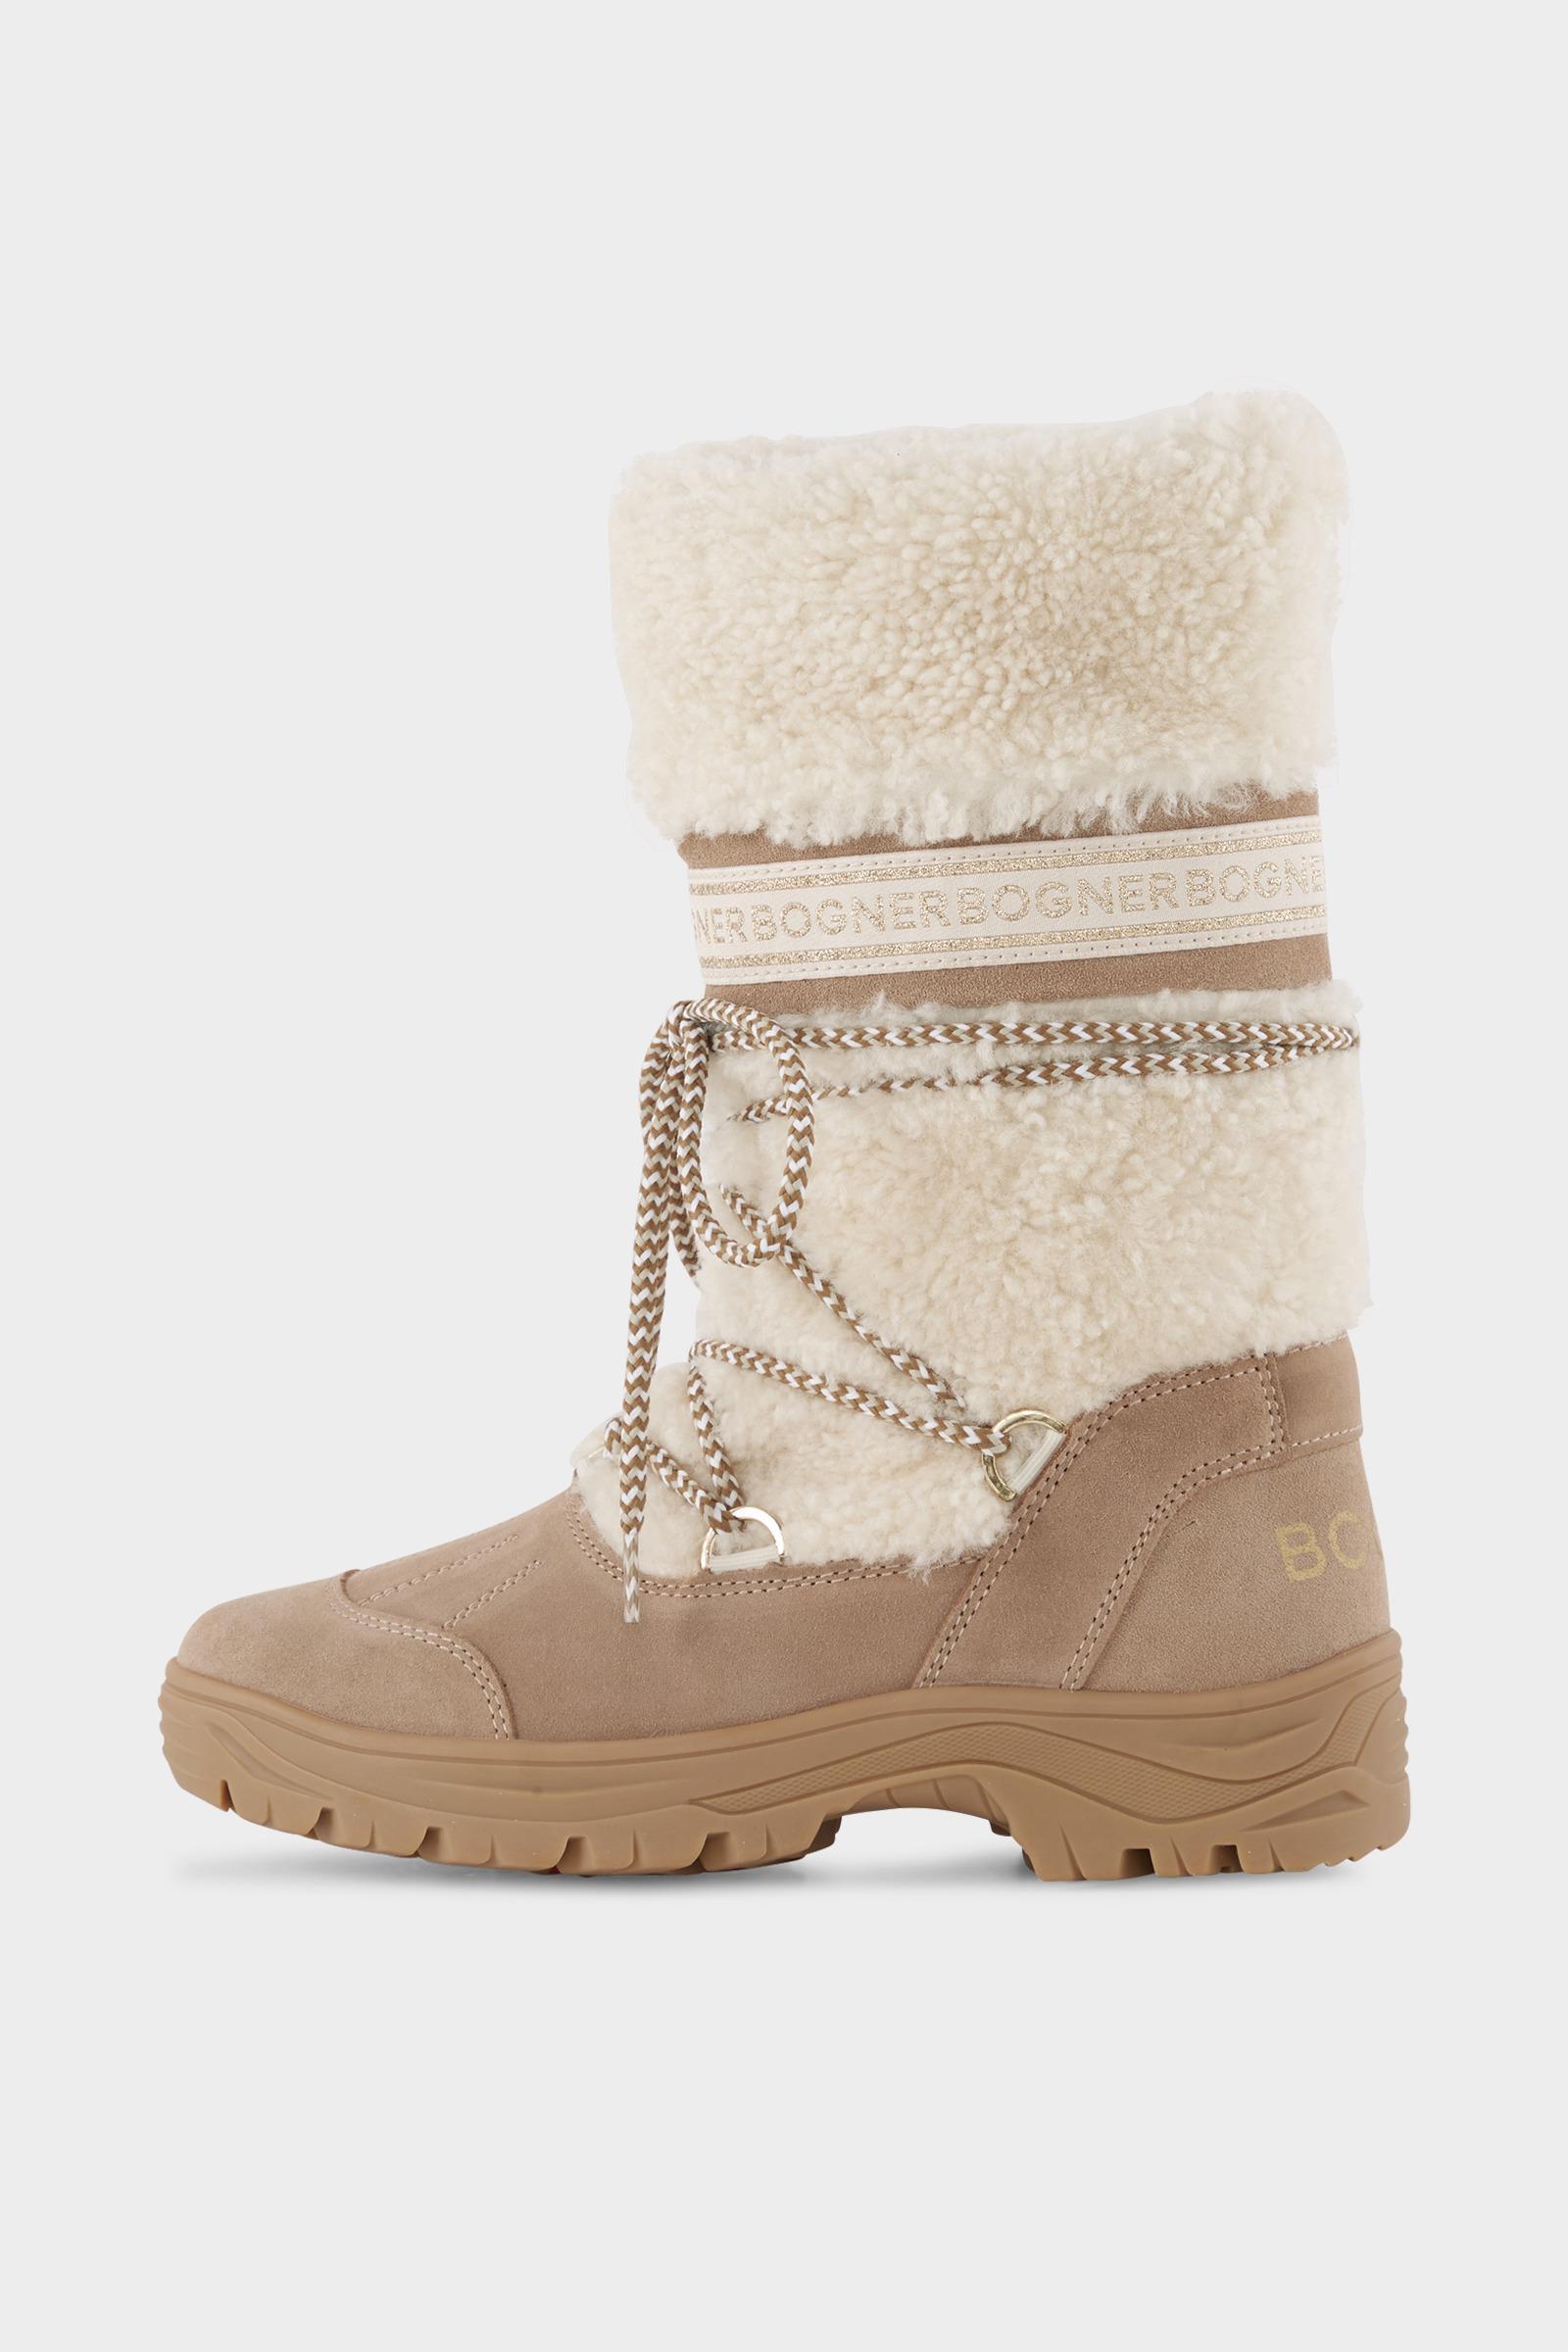 Bogner Suede Alta Badia Boots In Beige Off White In Natural Lyst